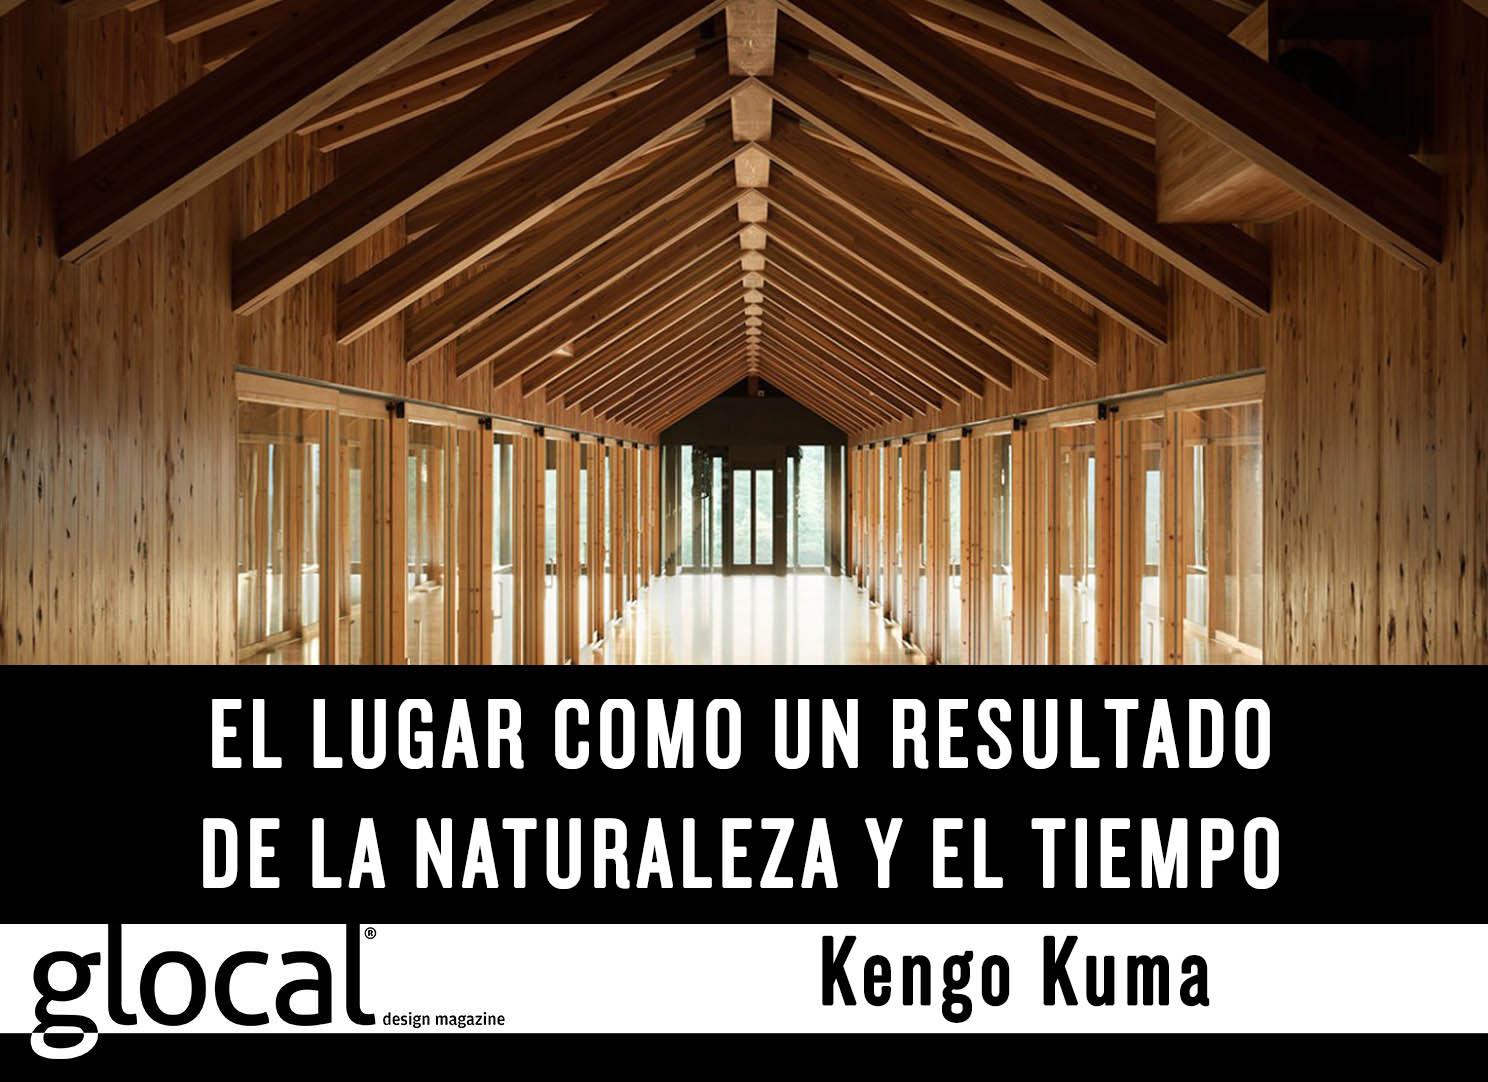 #GlocalQuote de @kengokuma arquitecto contemporáneo, autor de Wind Eaves en disponible en Glocal 32 en Issuu https://t.co/vjToMq0KL3